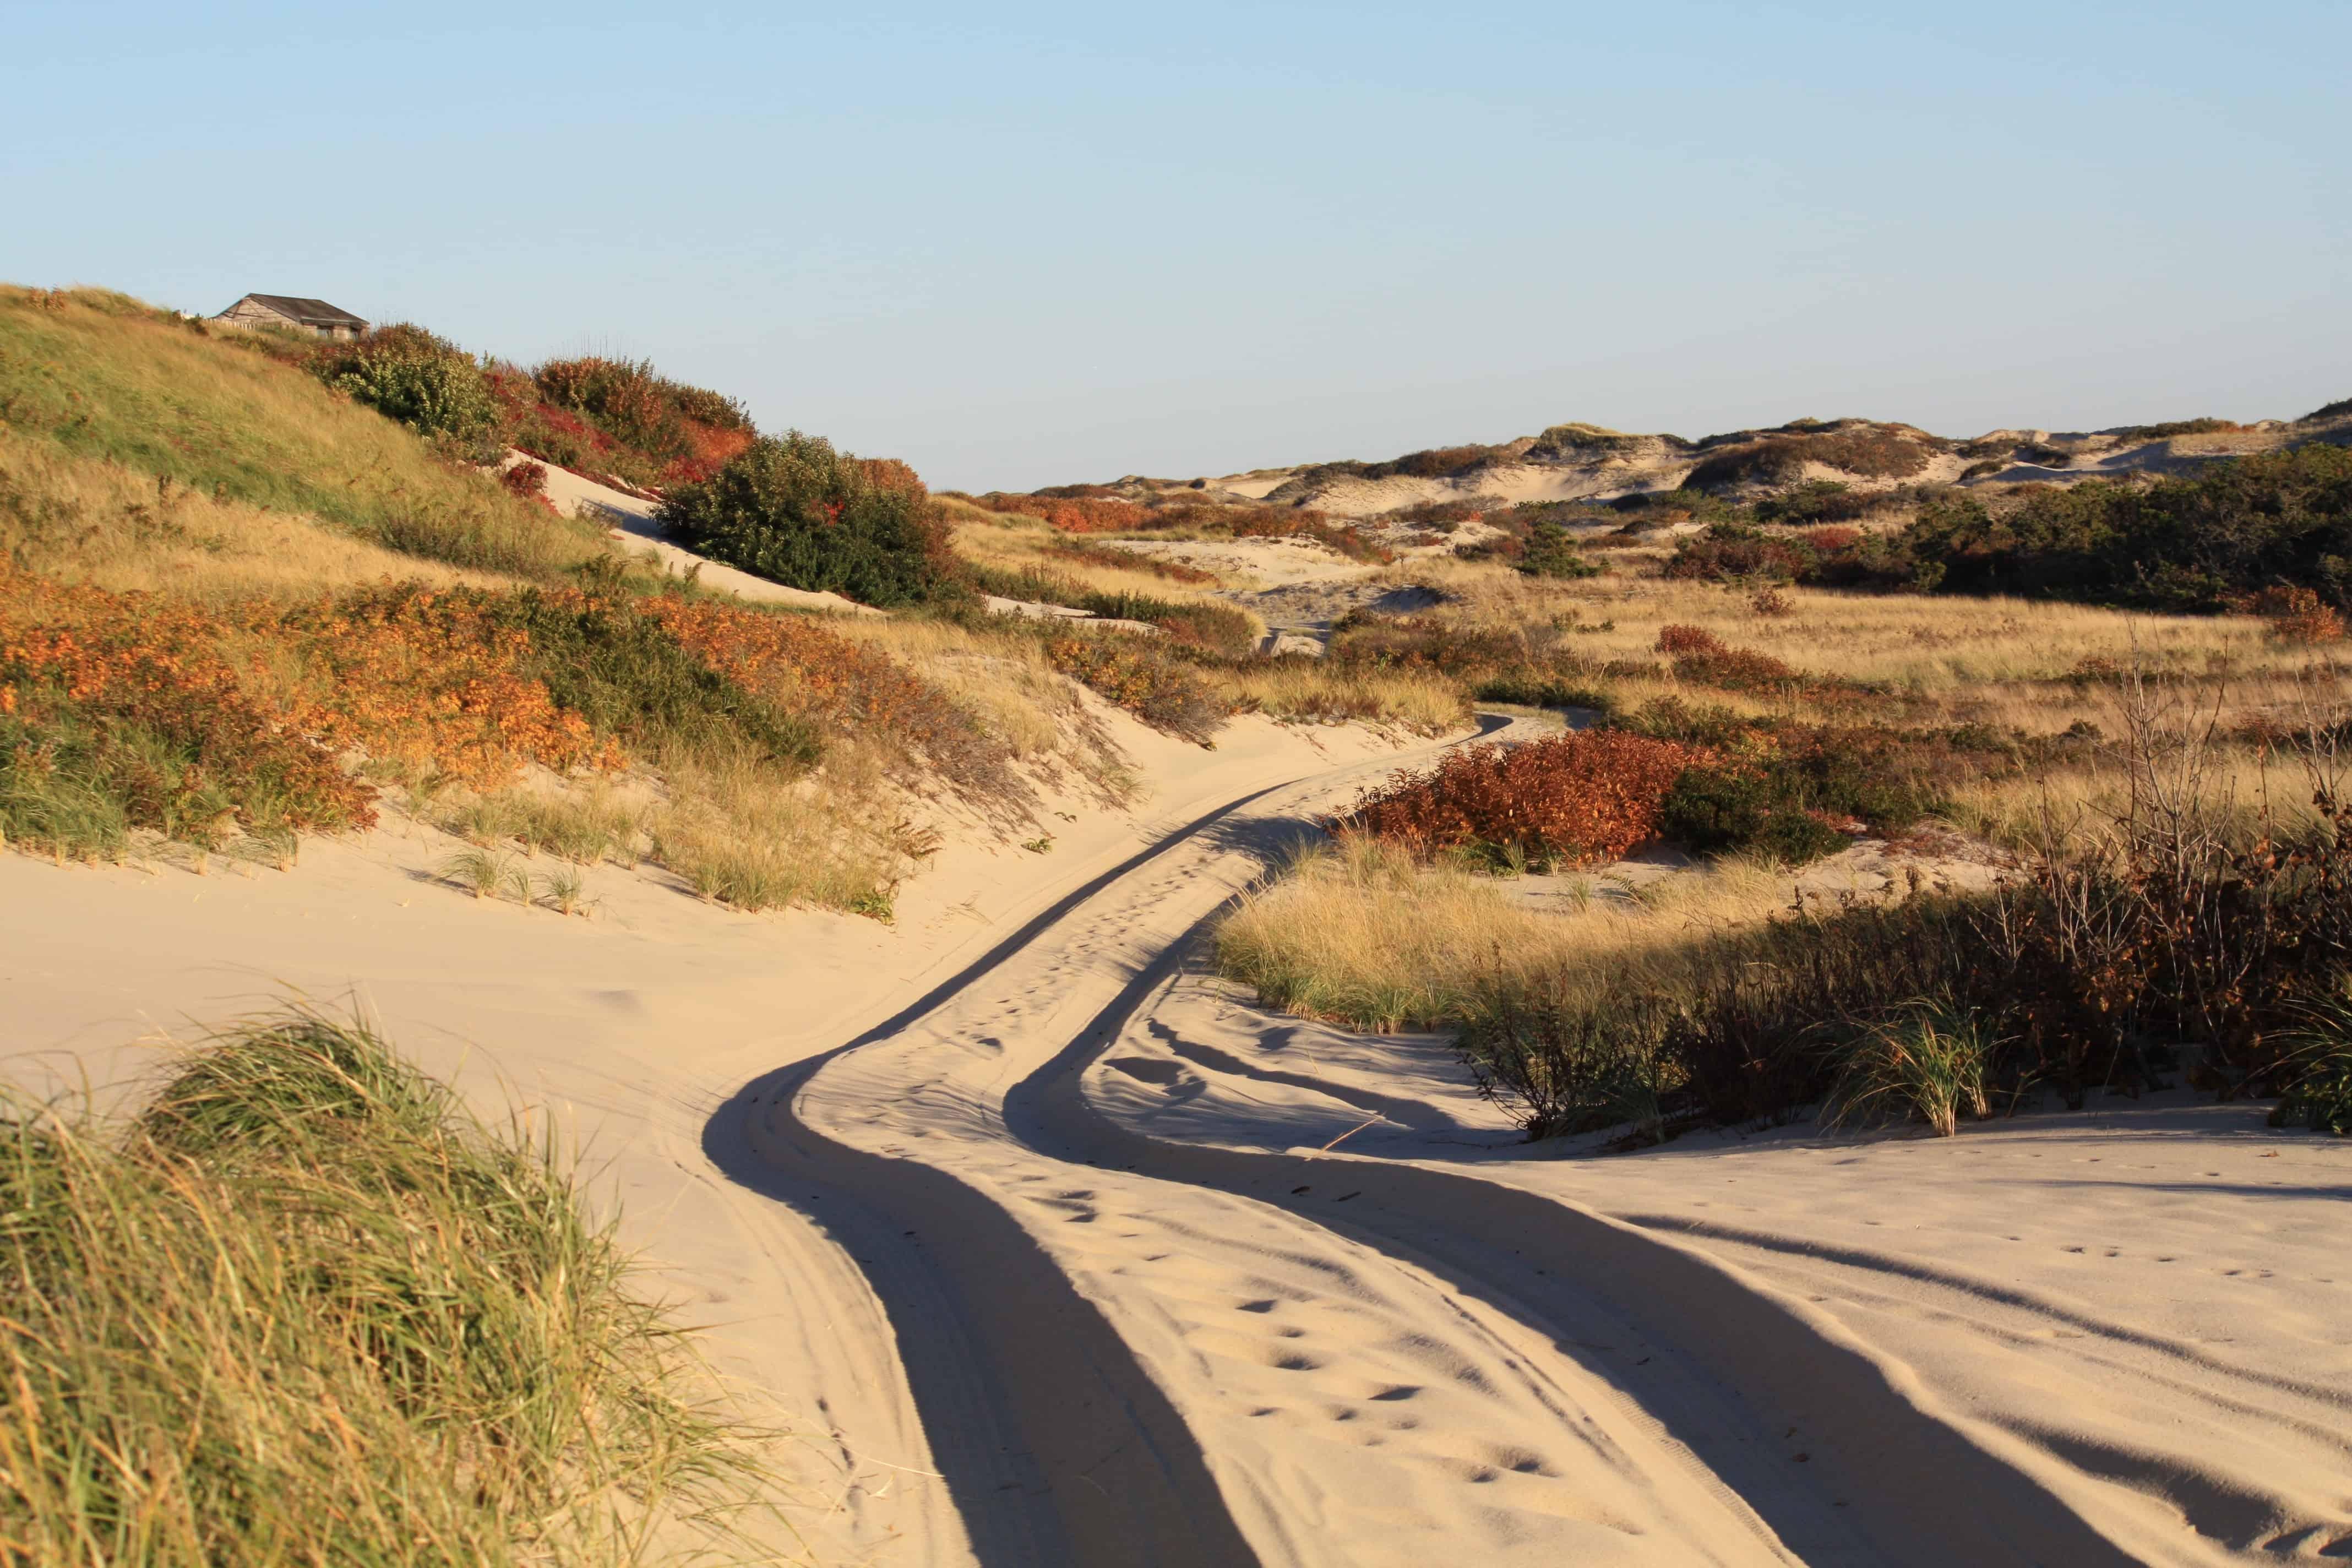 Dune Shacks Cape Cod Part - 18: Dune Shacks